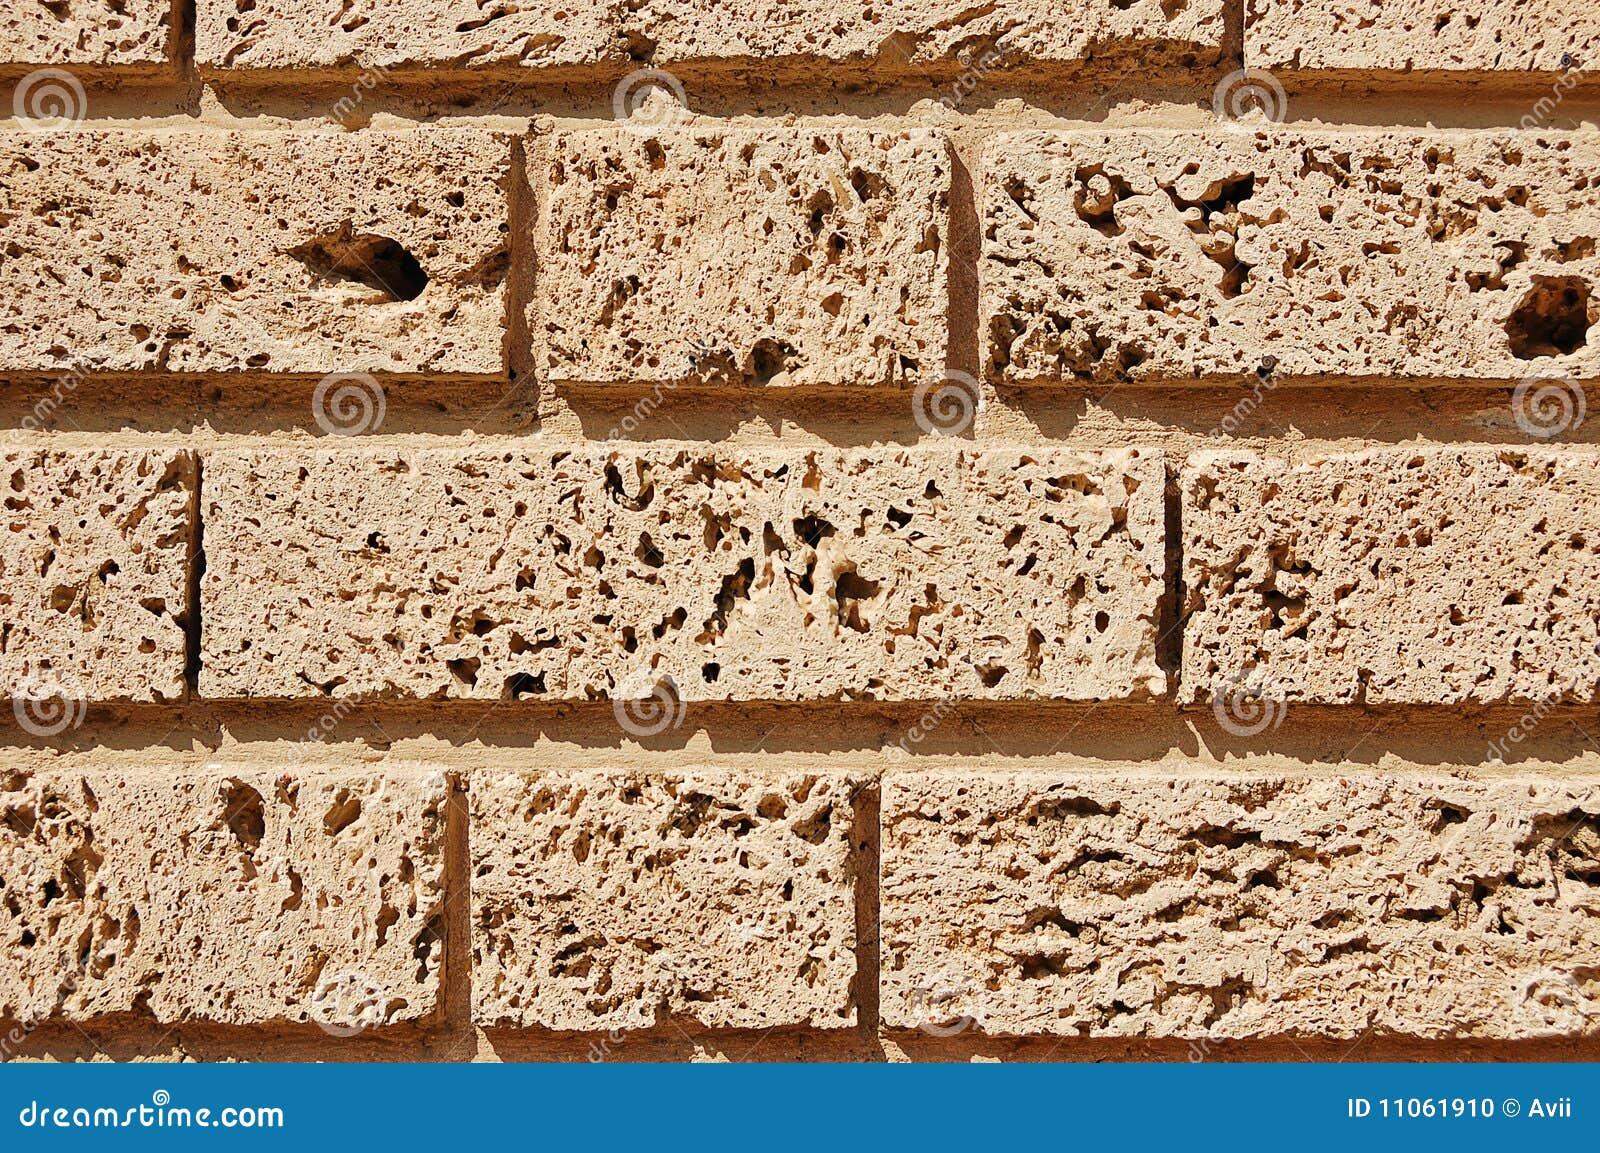 Fragment of a porous limestone wall